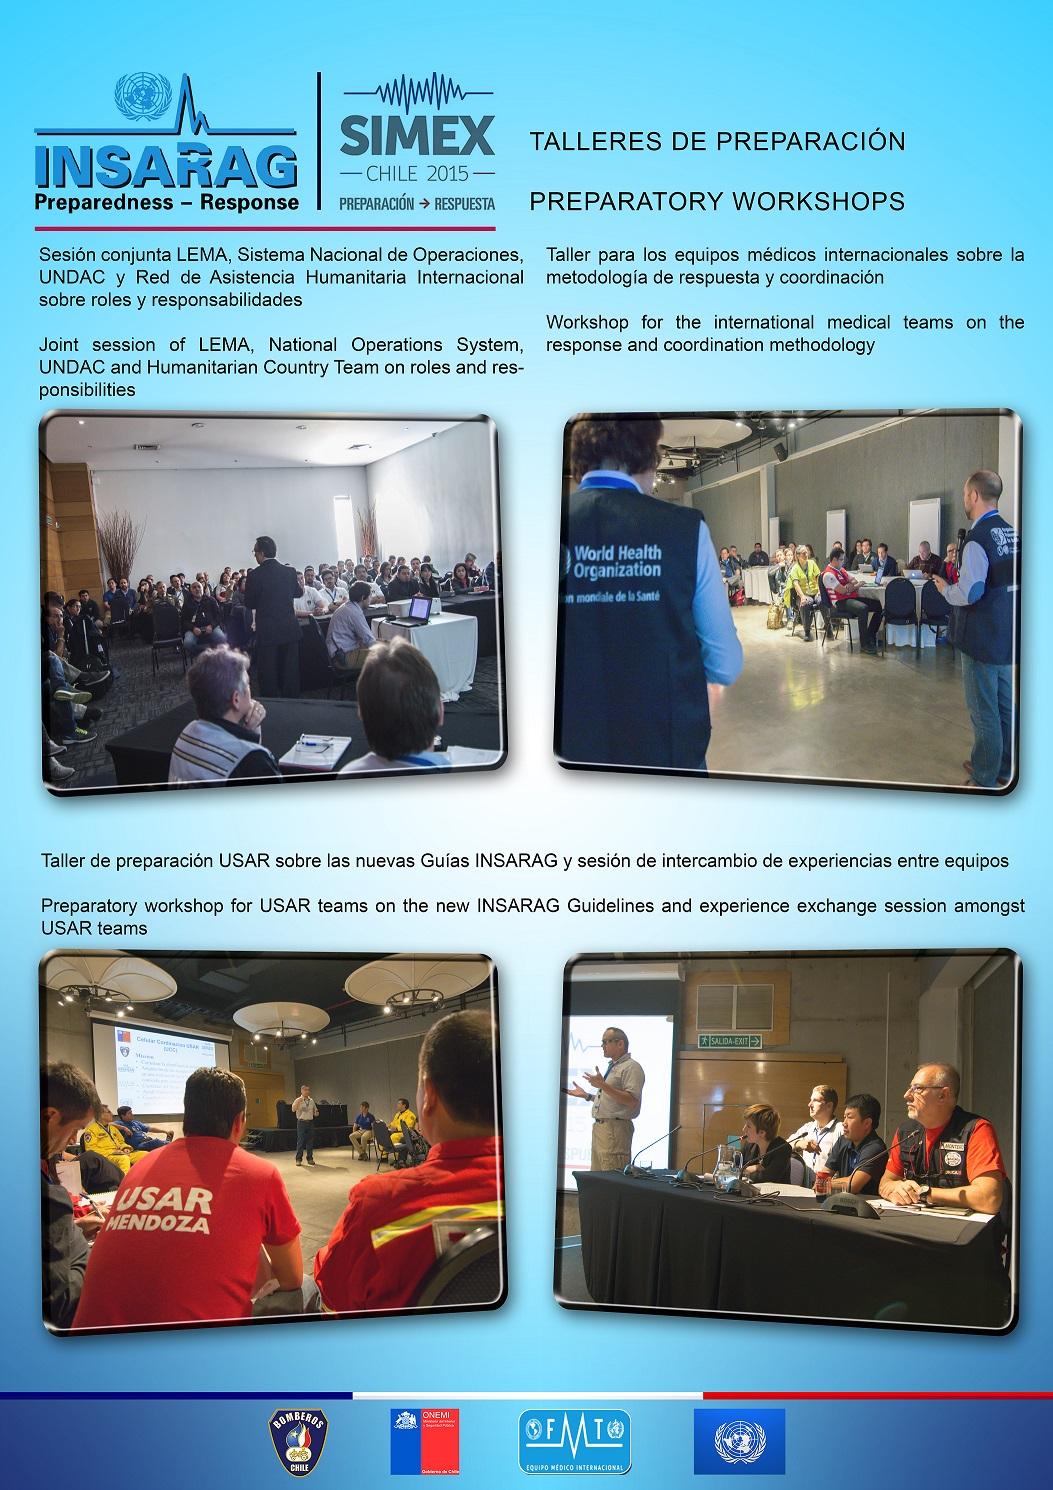 SIMEX_Chile_2015__04_prep_workshops_1